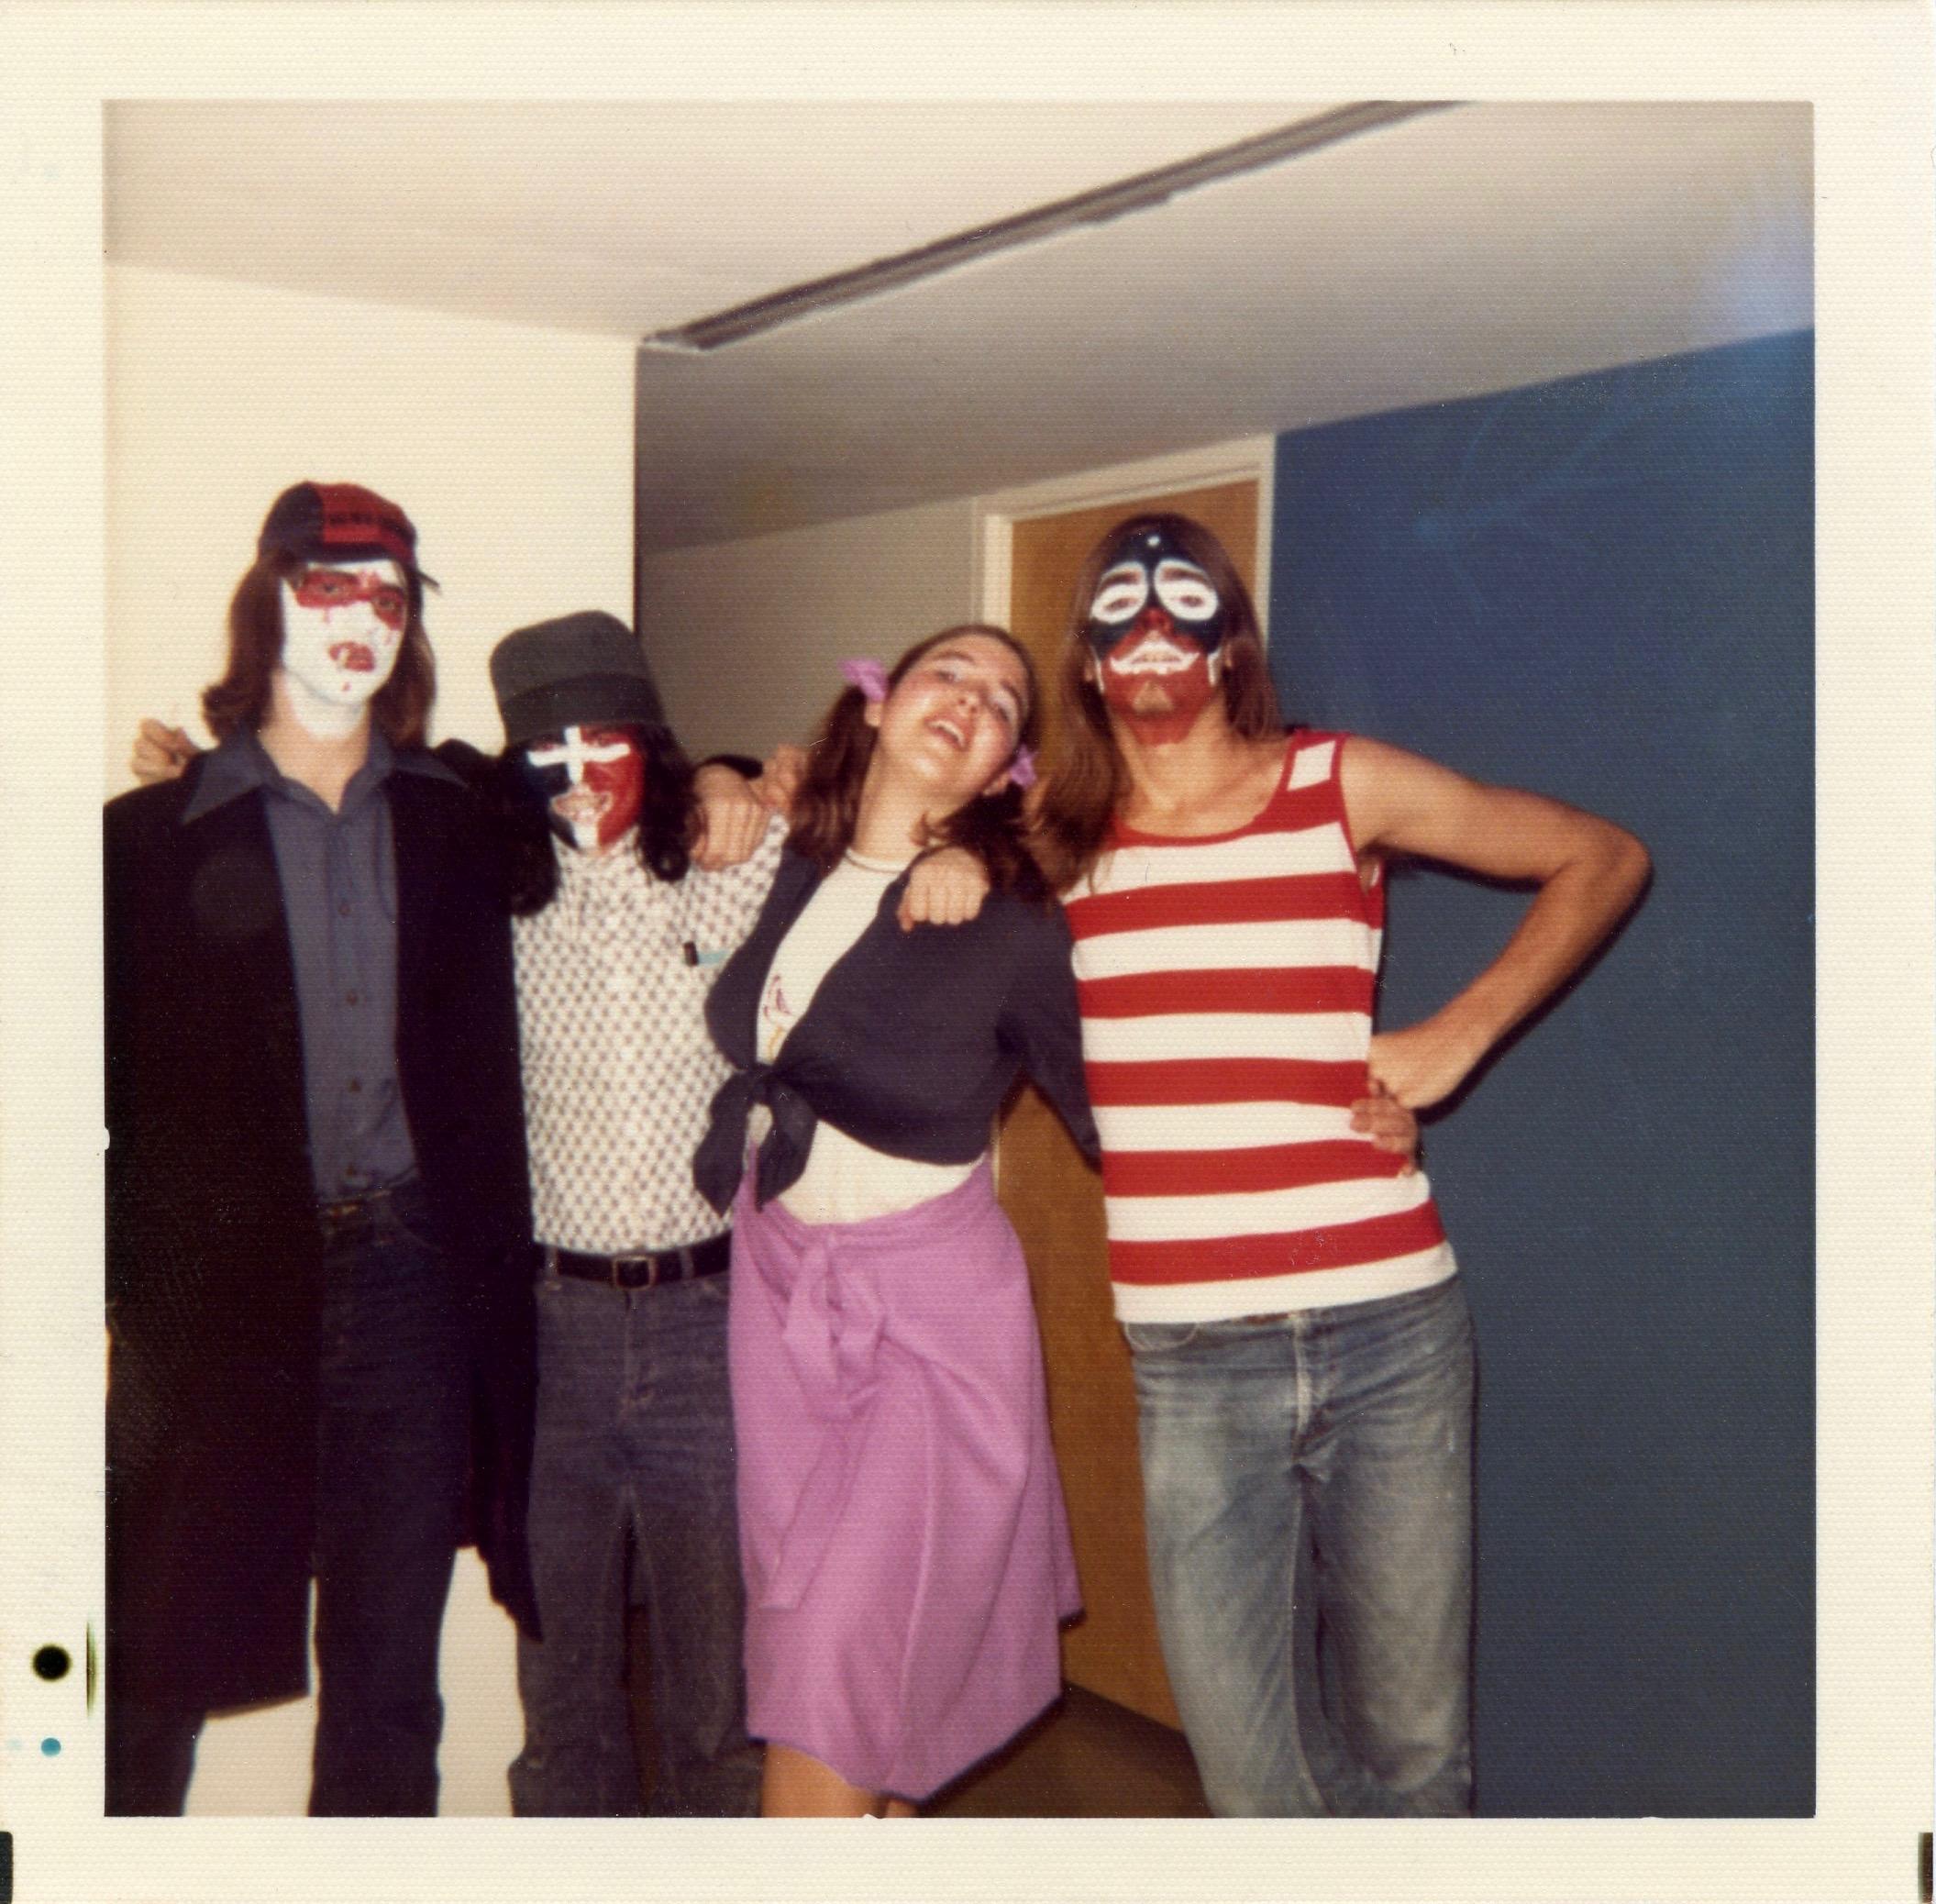 RJ, Don, Loretta, Keith in Lethbridge, c. 1975